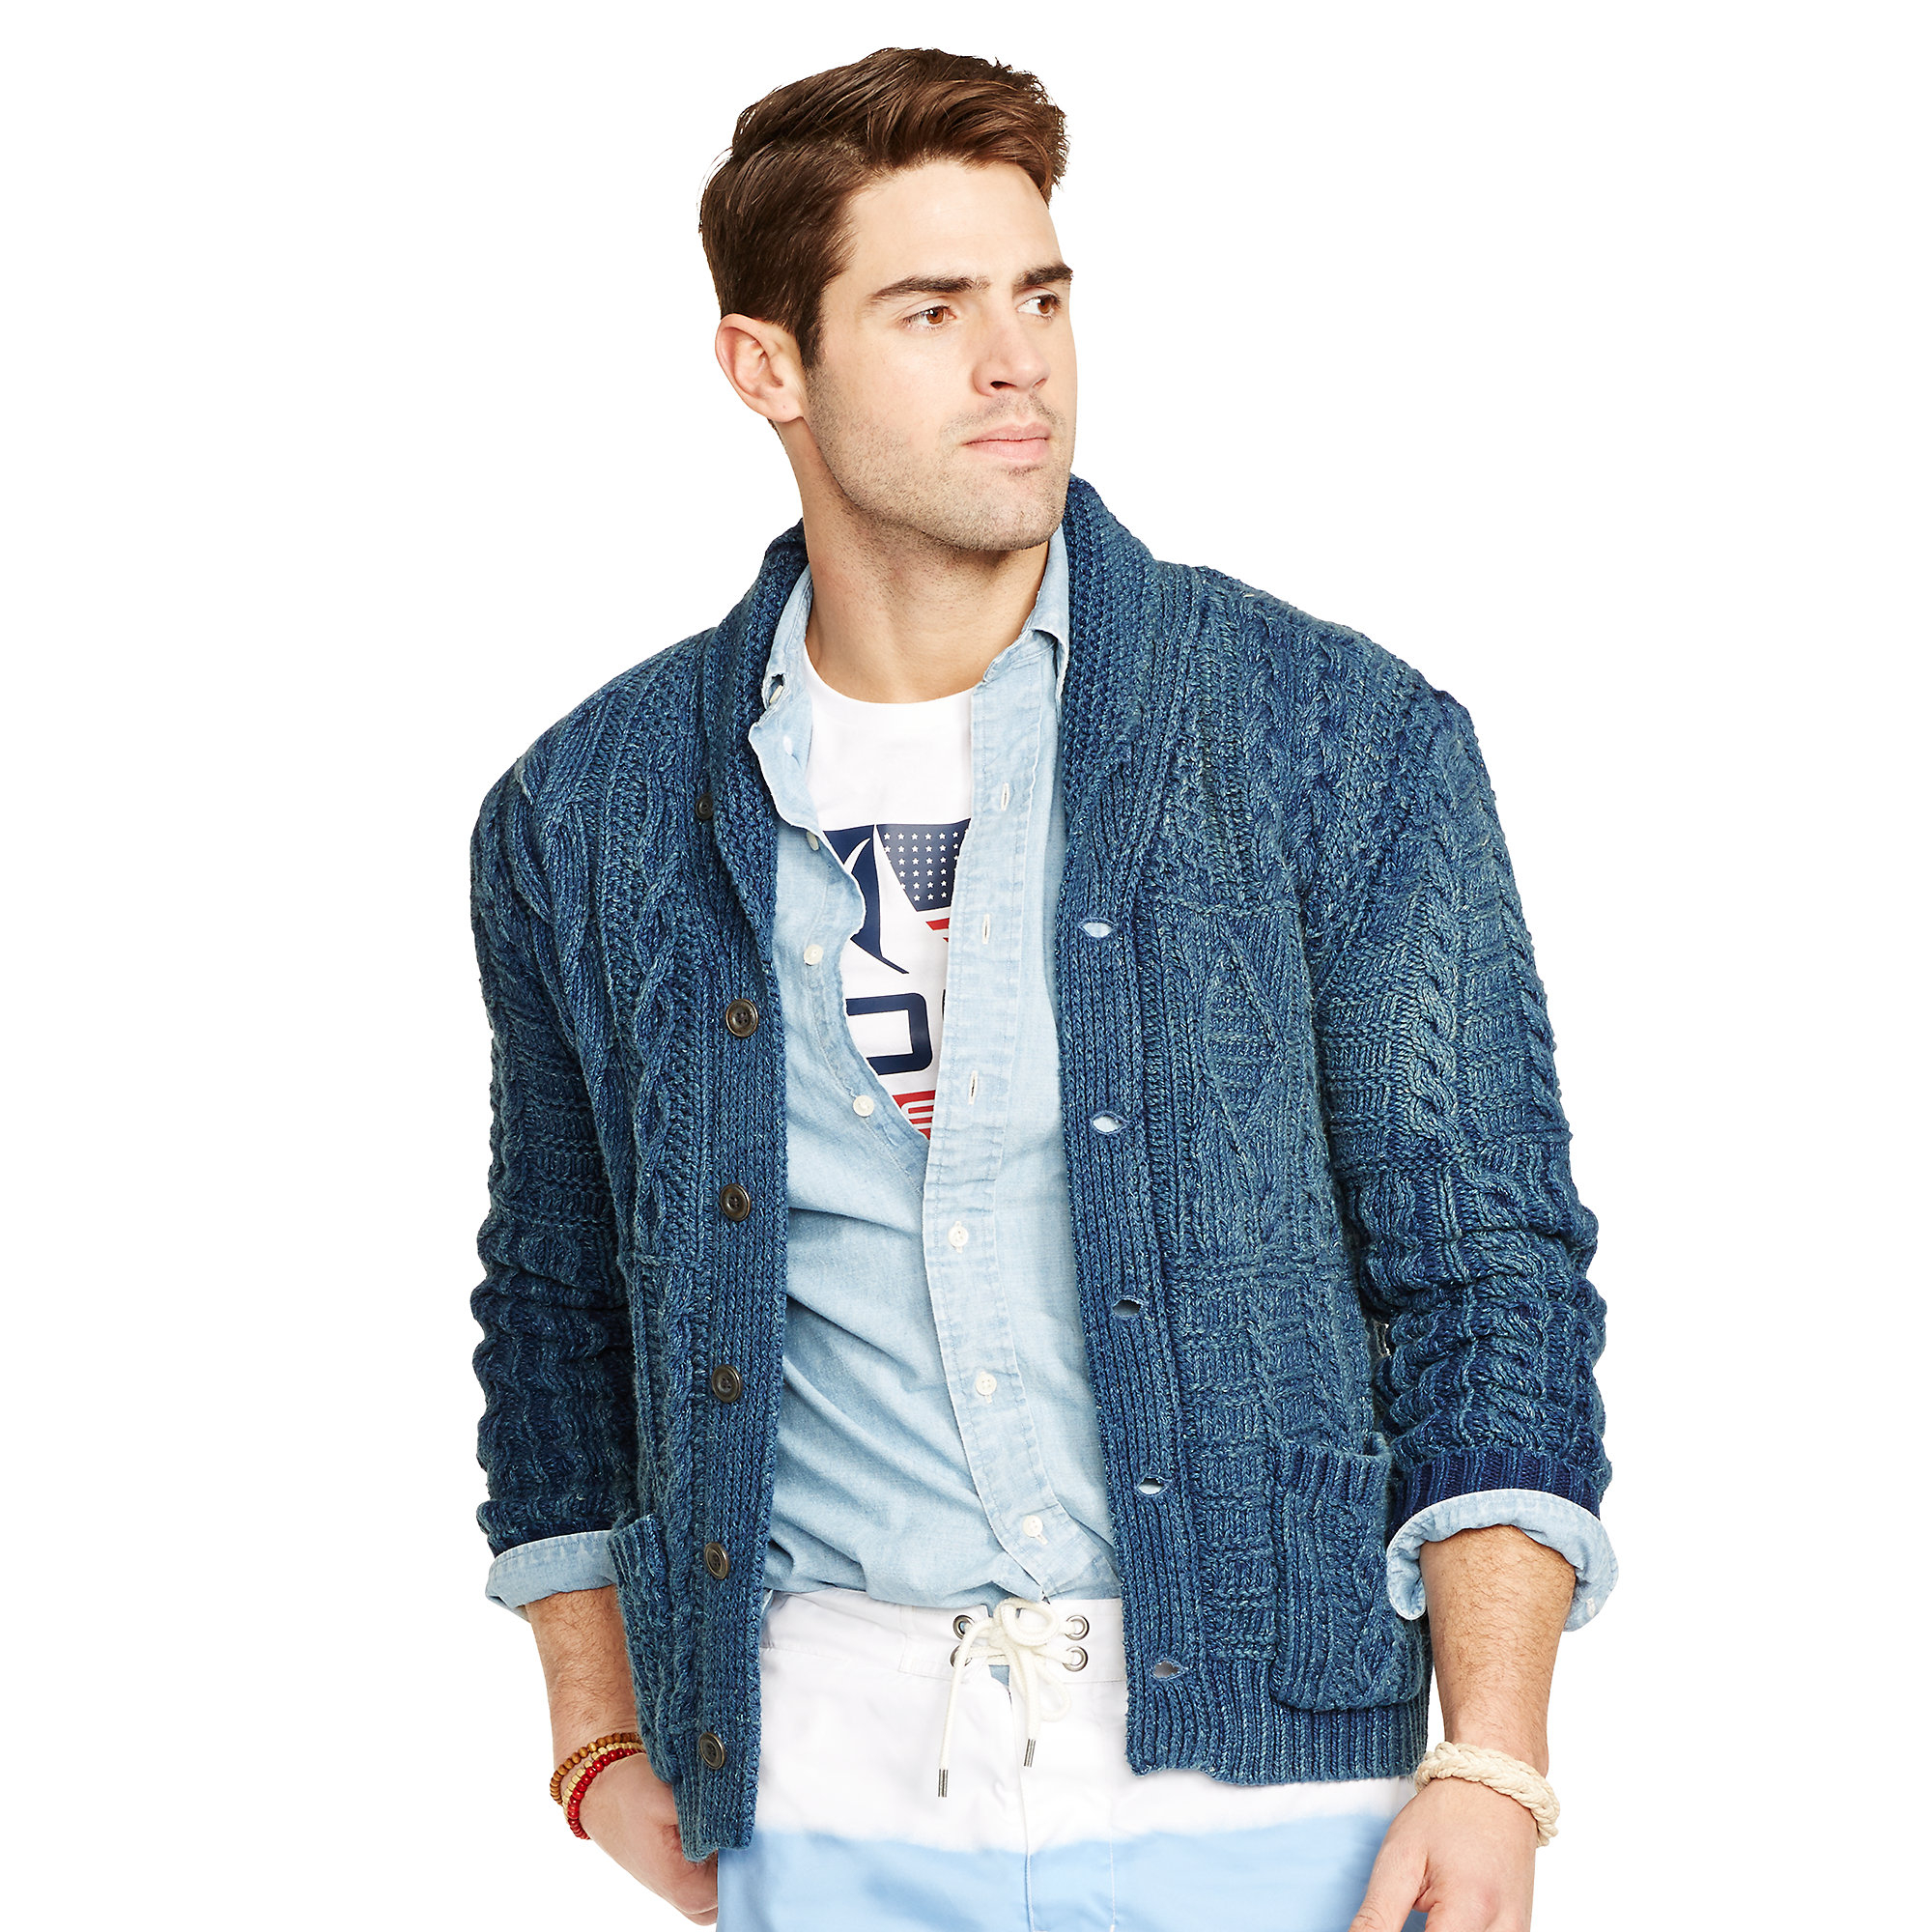 b81d53f48 ... uk lyst polo ralph lauren indigo cotton shawl cardigan in blue for men  bf2e4 fda59